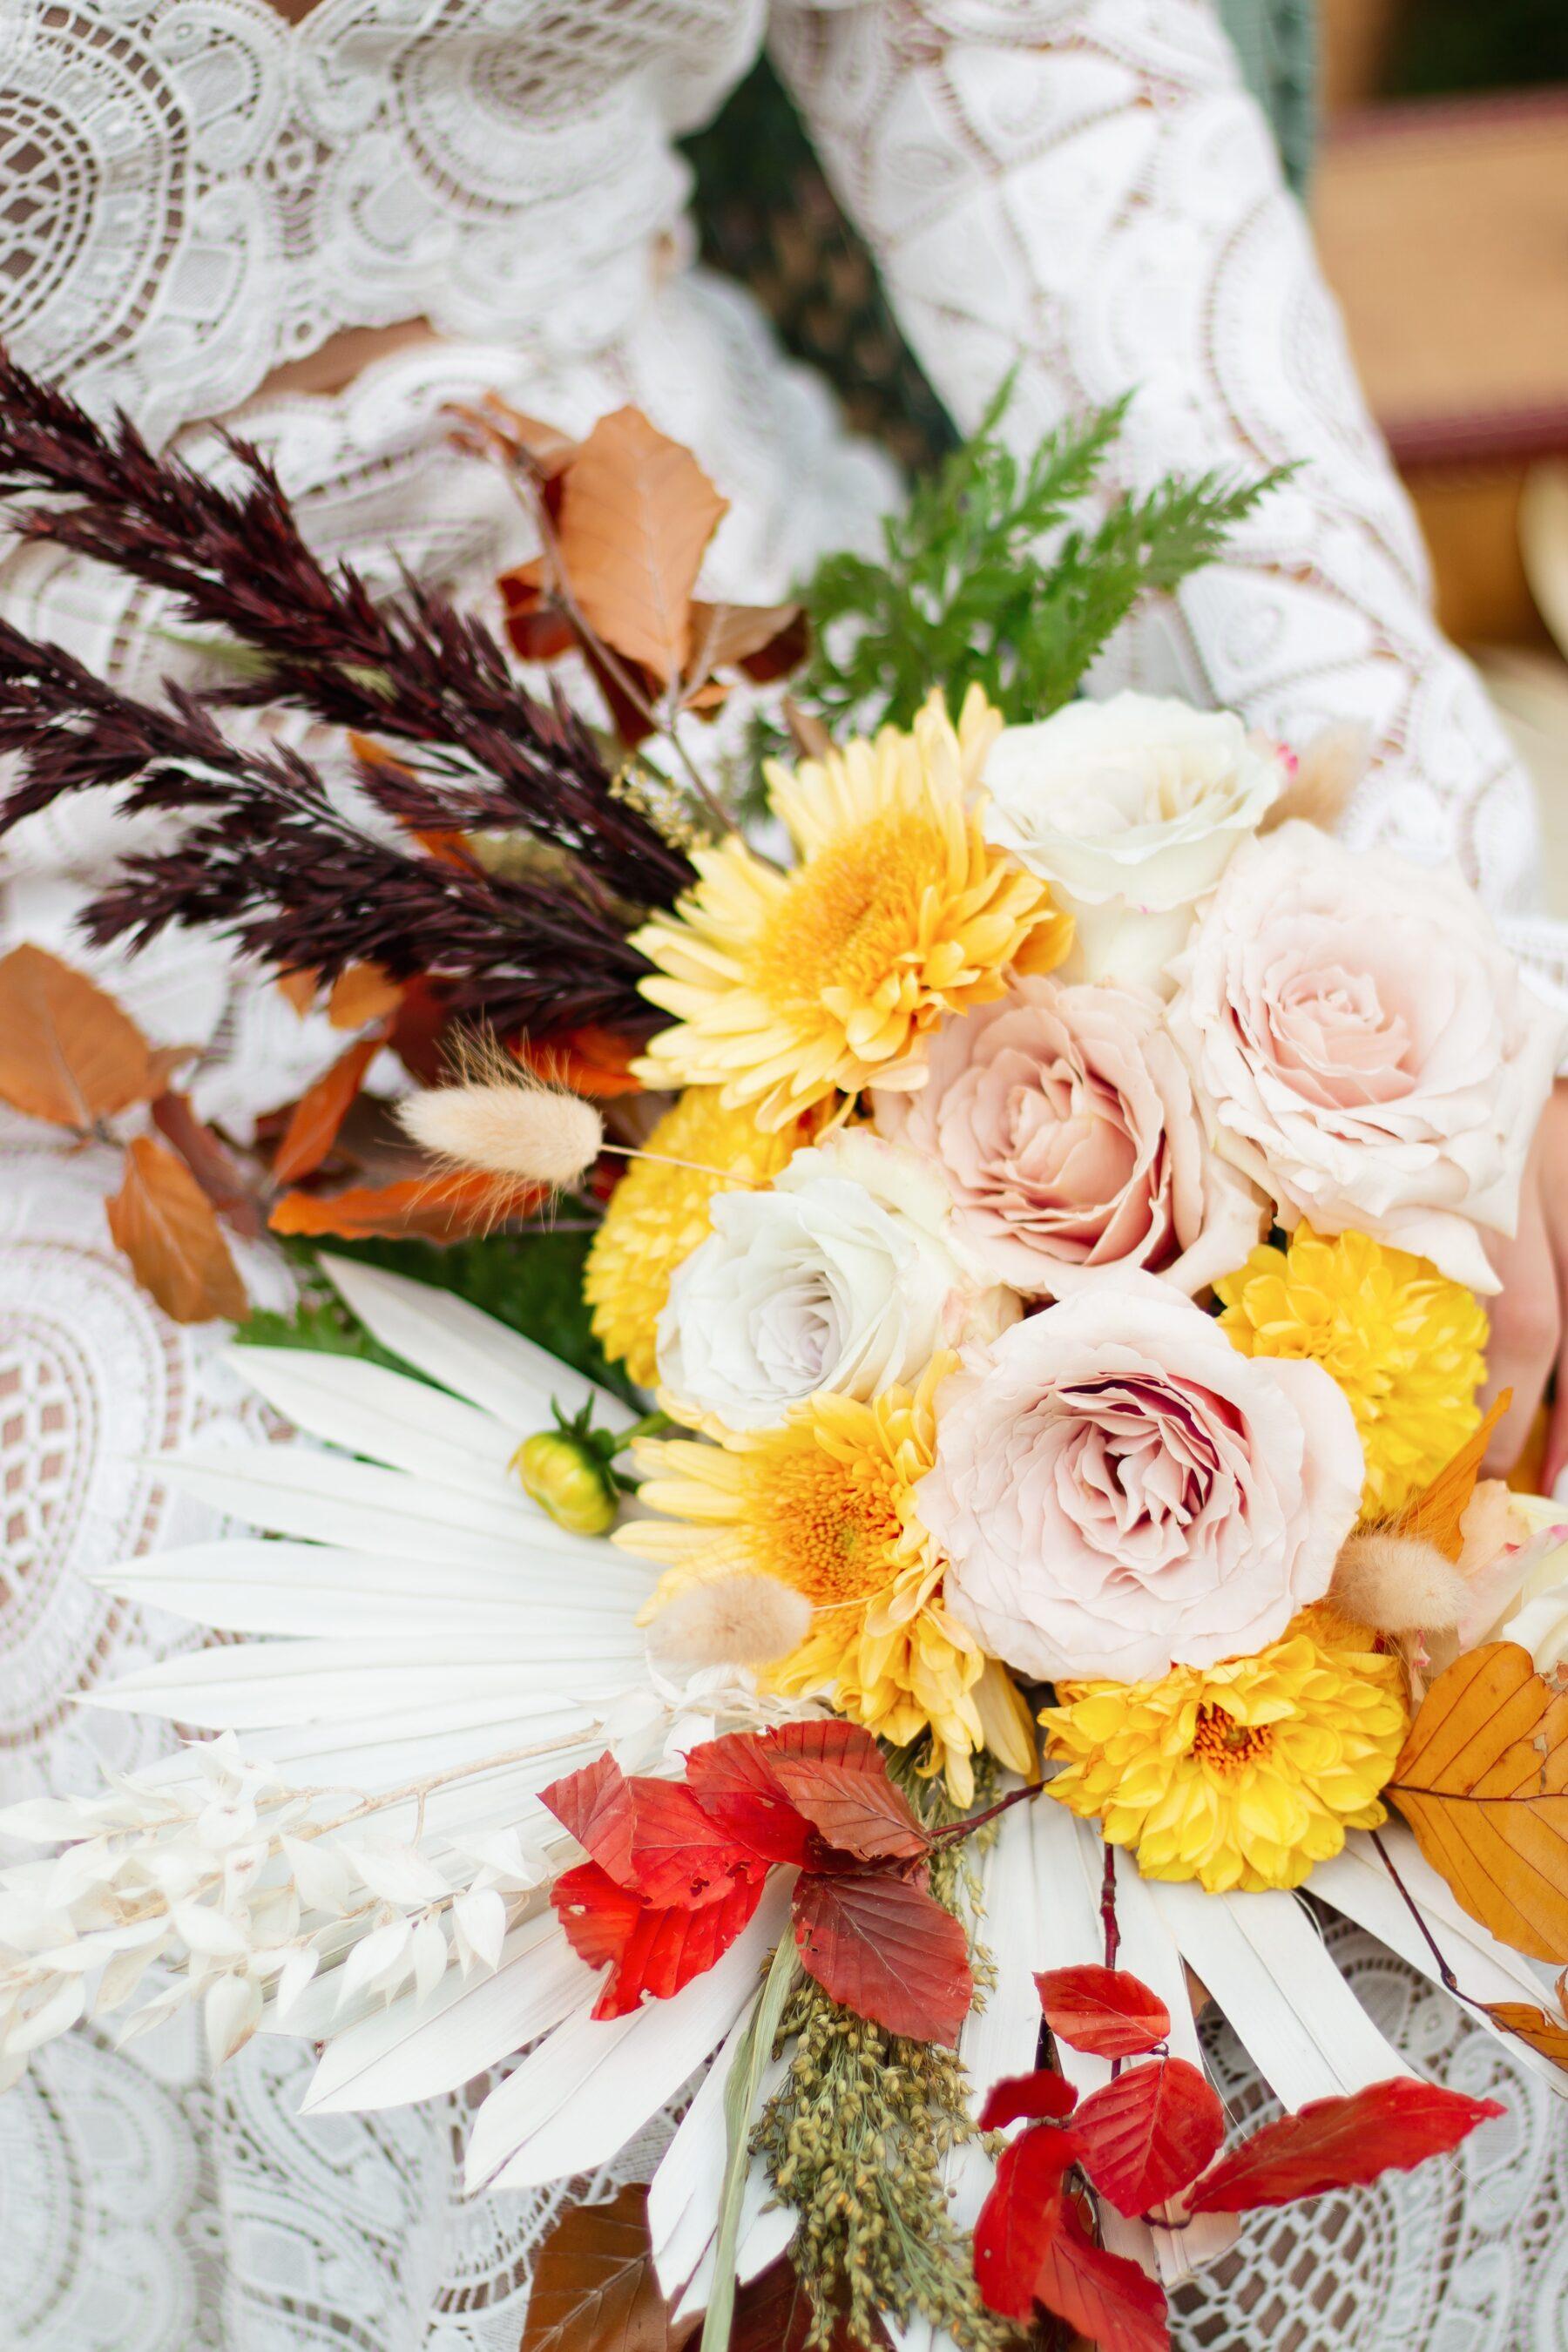 Meet Nashville Wedding Planner My Joyful Event featured on Nashville Bride Guide